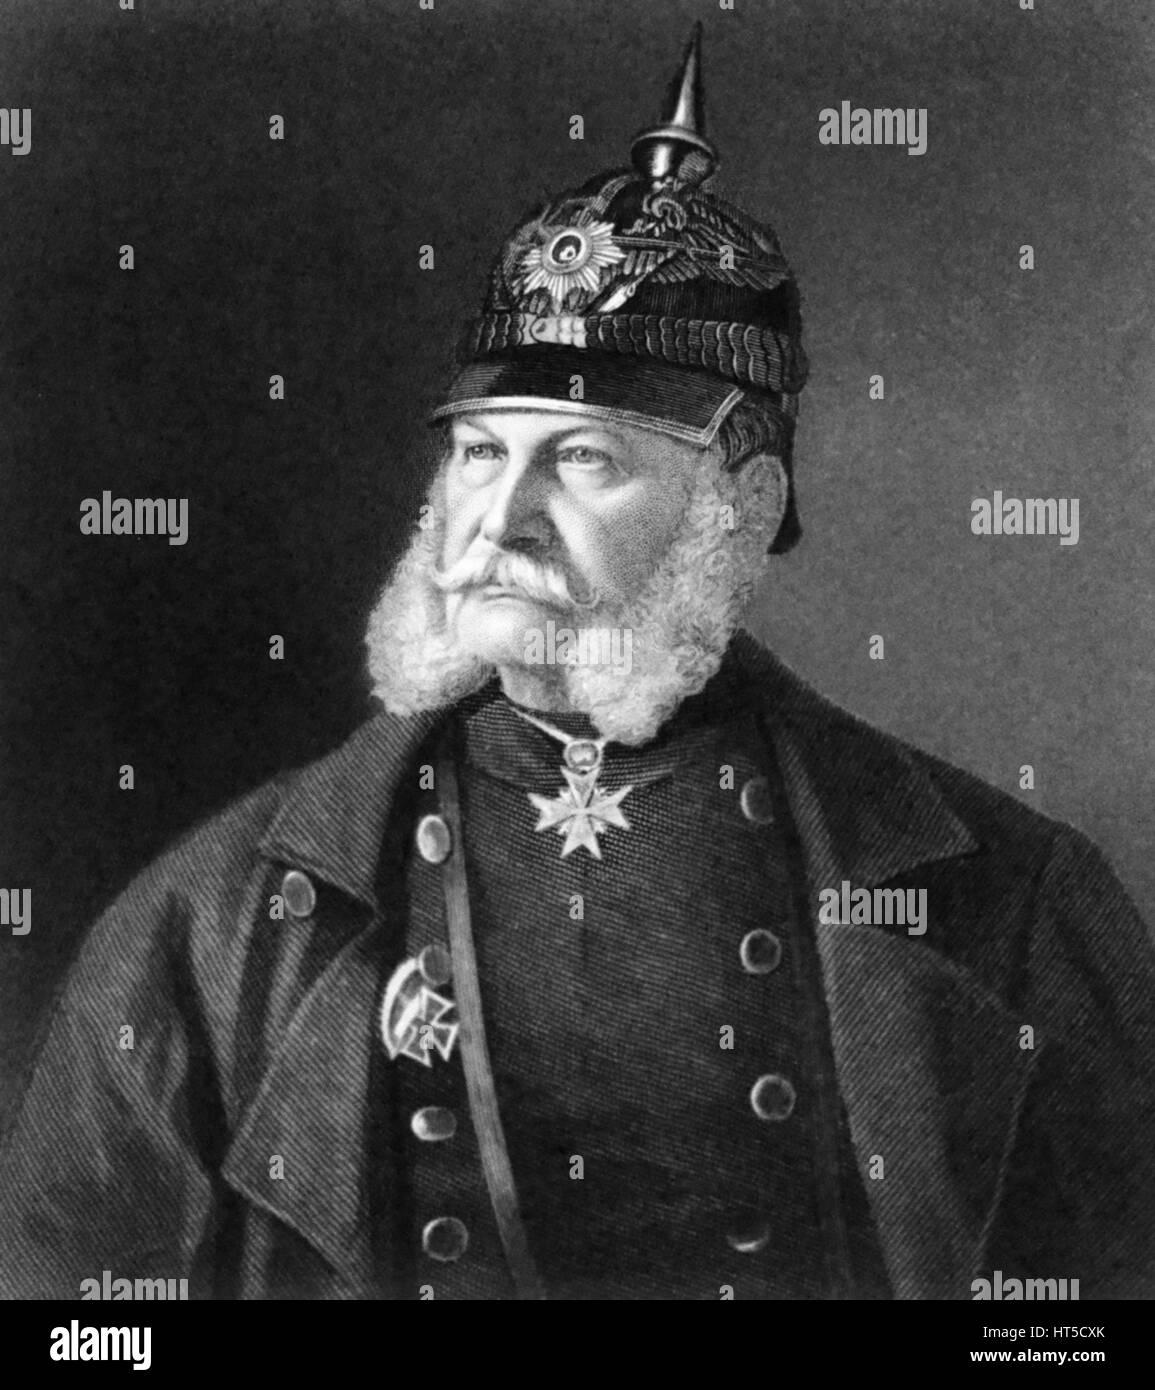 WILLIAM 1, Emperor of Germany (1797-1888) - Stock Image